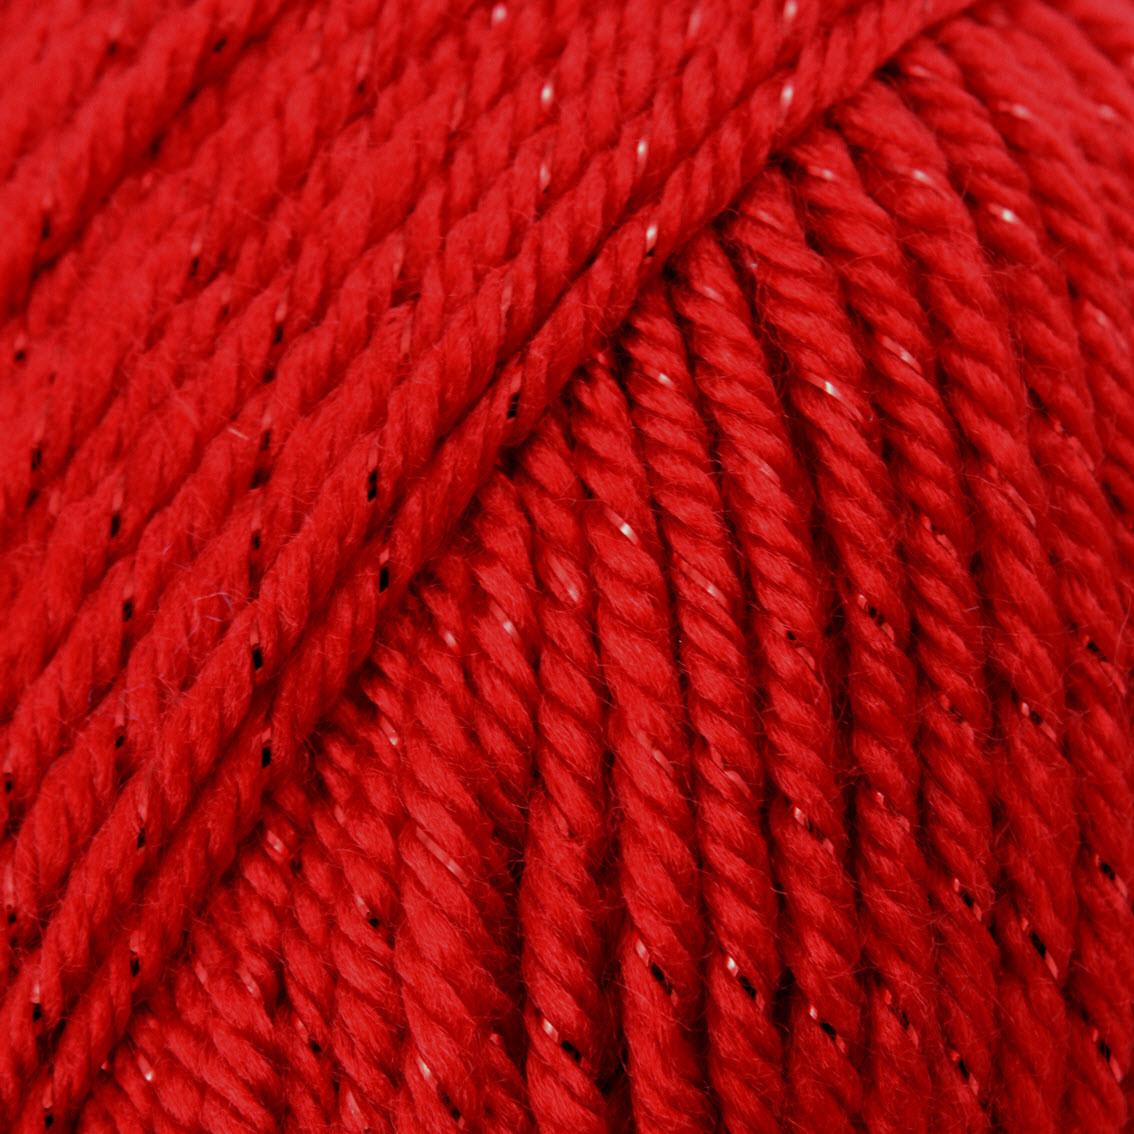 Caron Red Sparkle Simply Soft Party Yarn 4 Medium Free